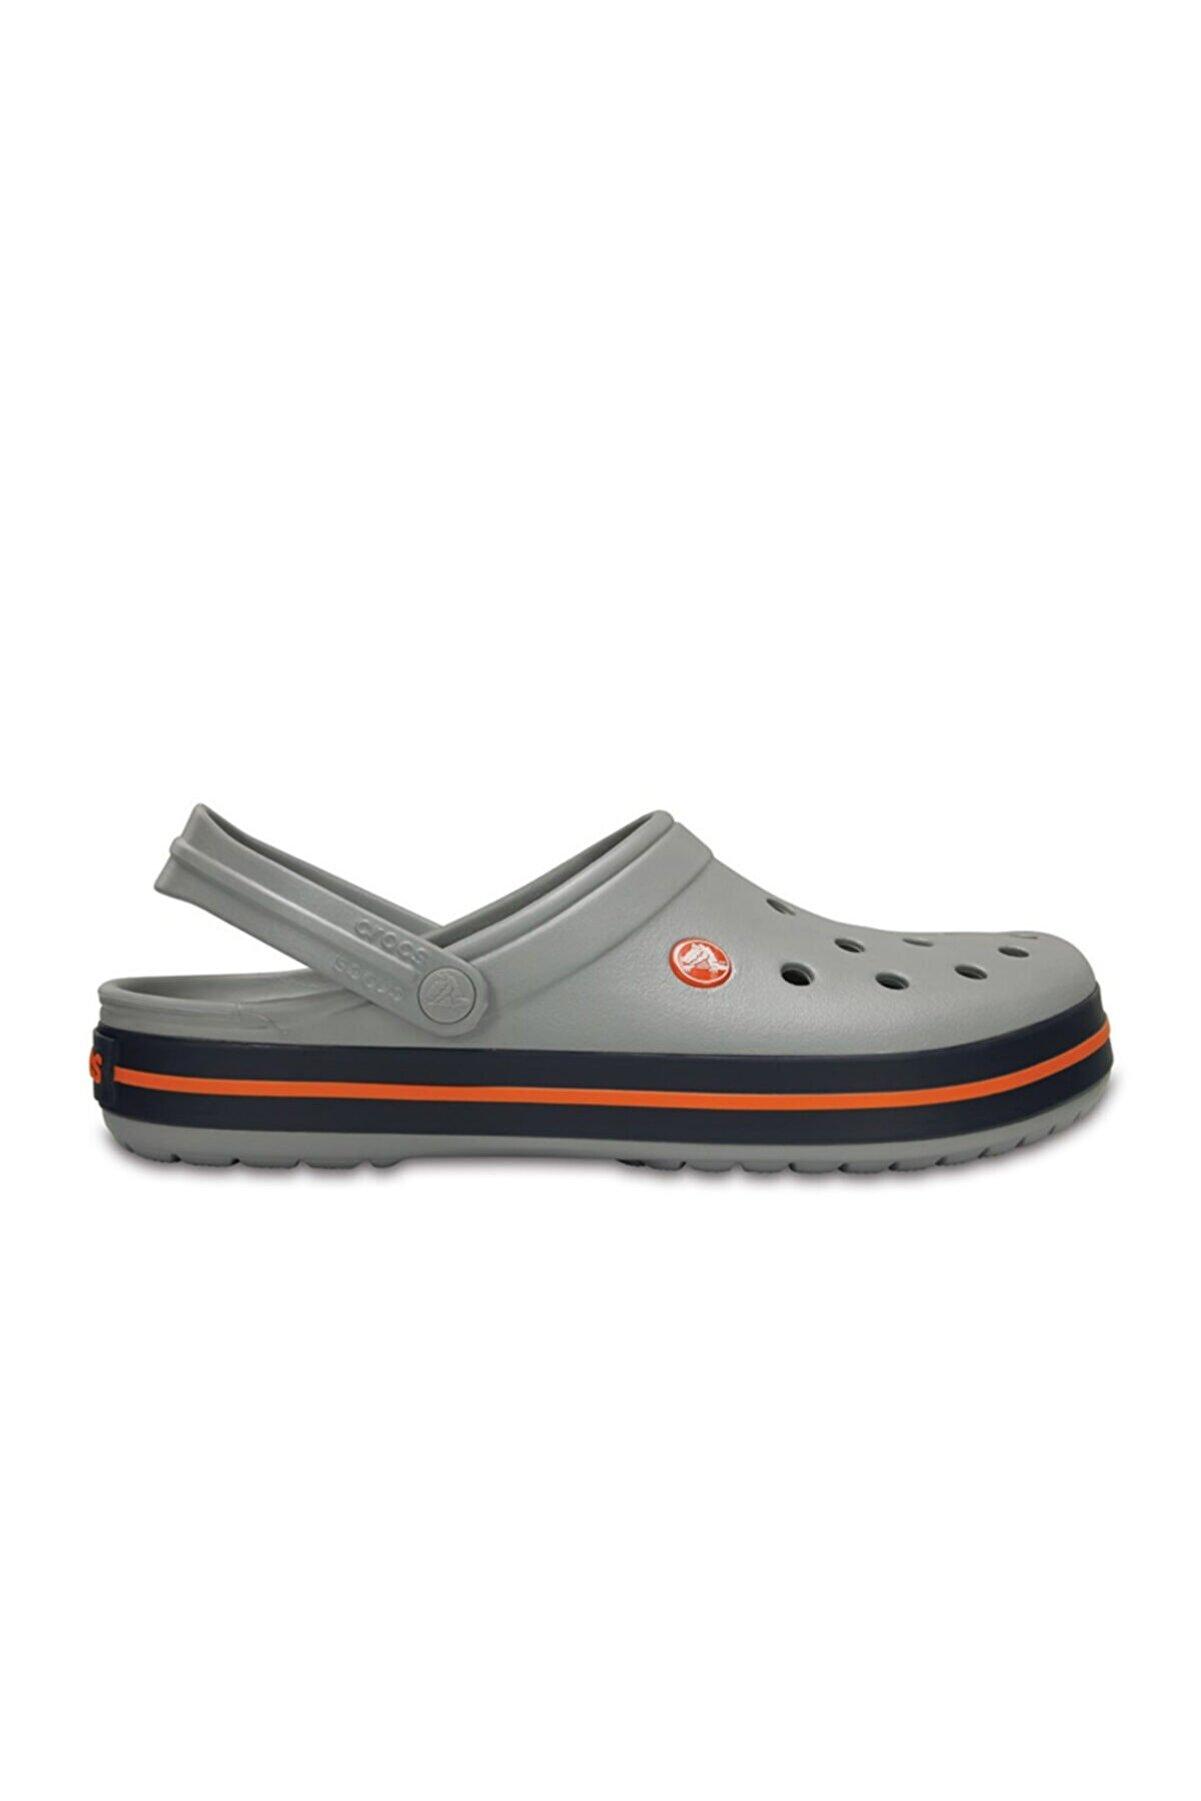 Crocs 11016-01U Crocband Terlik